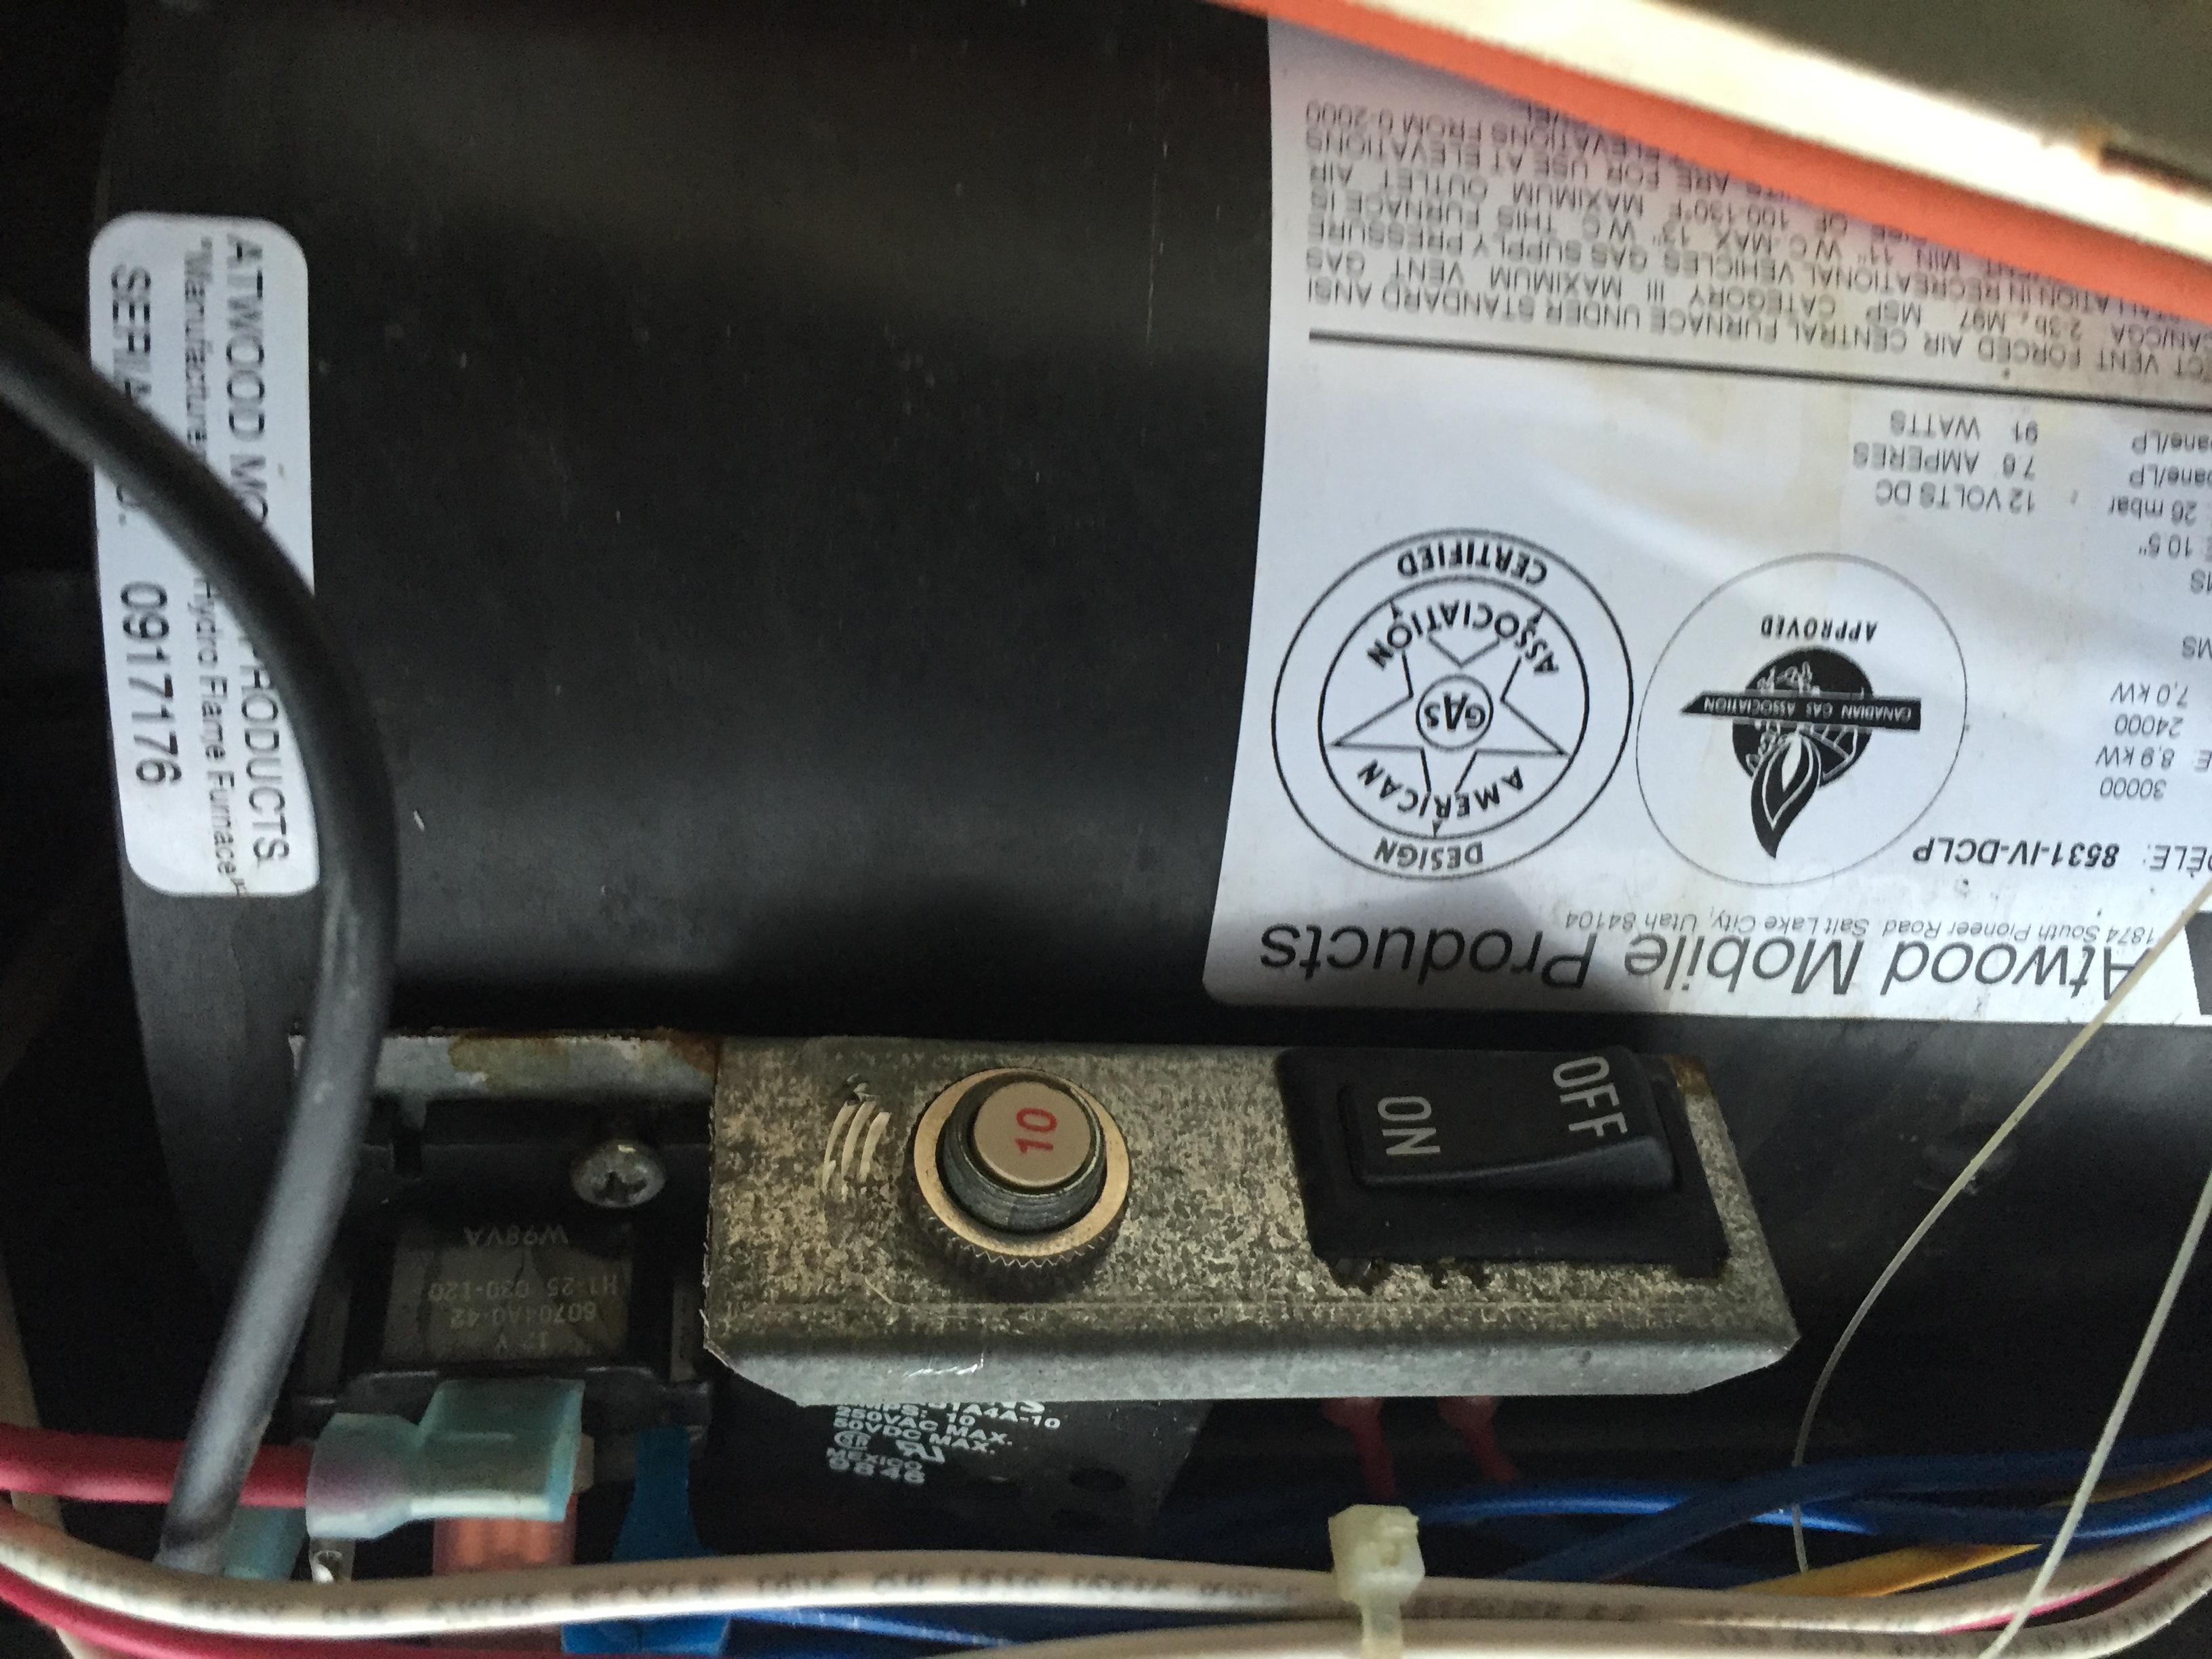 Monaco Windsor Wiring Diagrams Free Diagram For You 2005 Rv 97 1976 Dodge Coach Brake Control